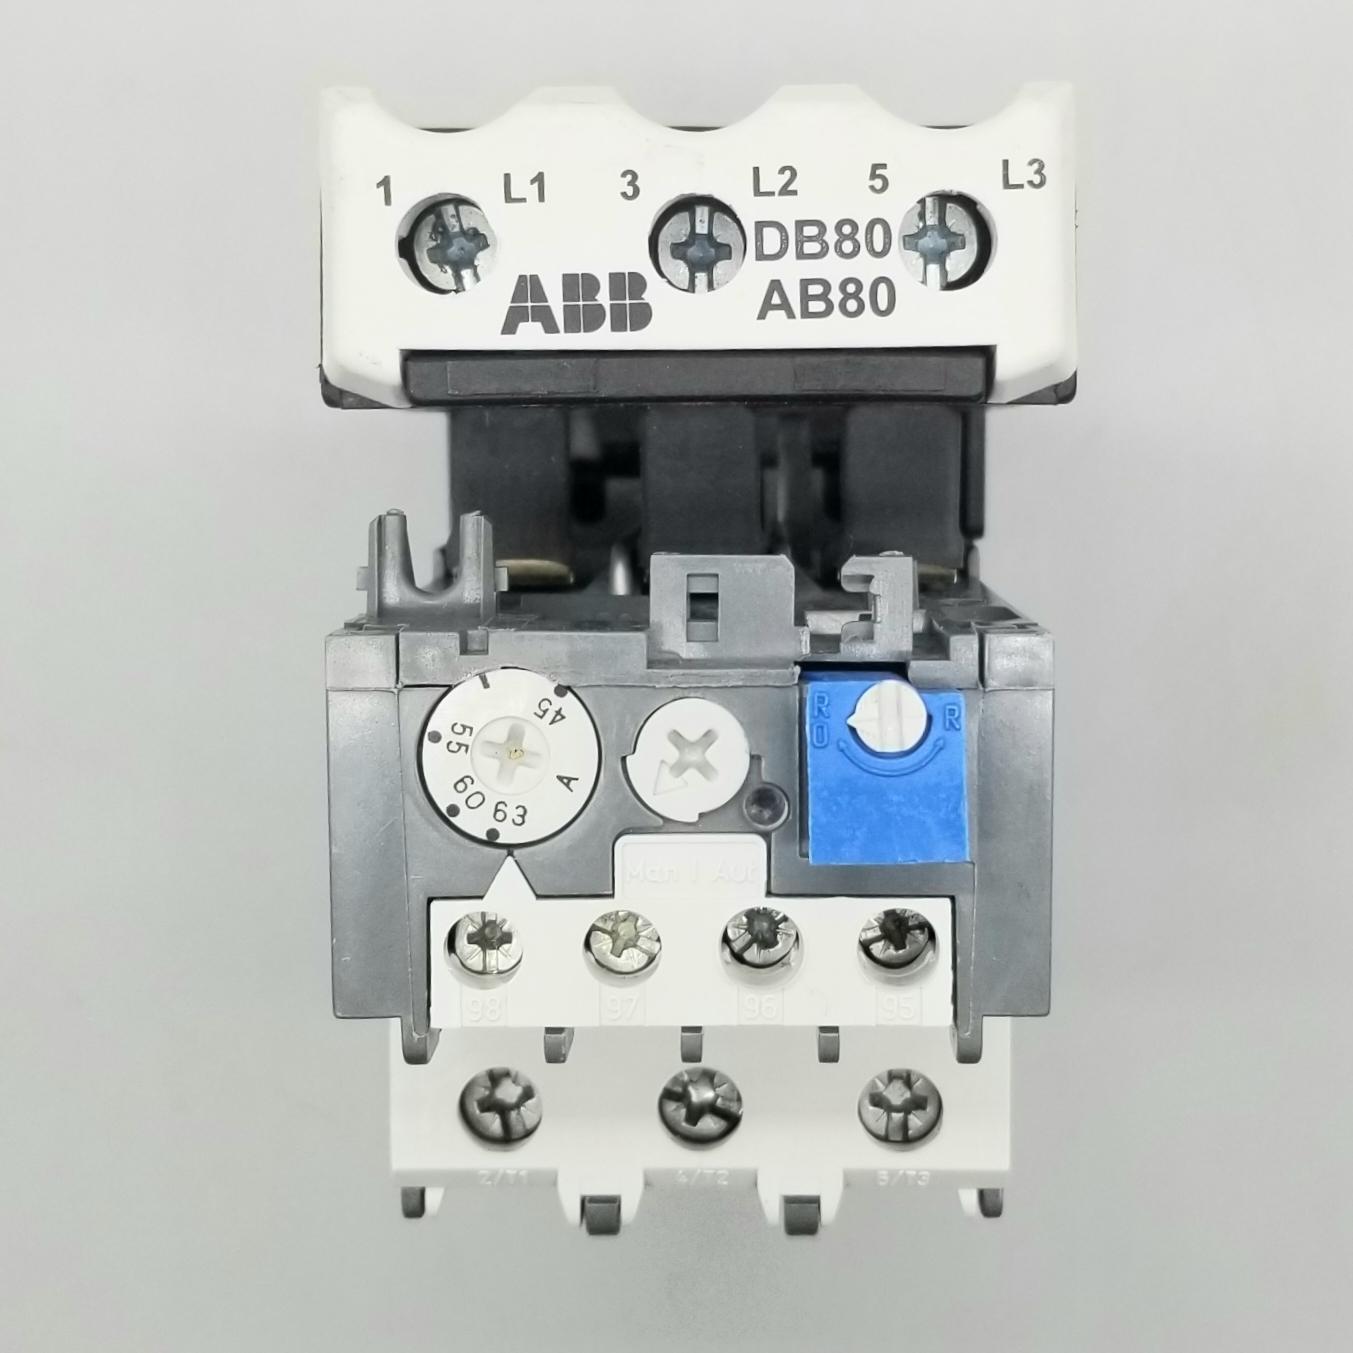 ABB TA75 DU Overload Relay w/ ABB DB80 AB80 Mounting Kit